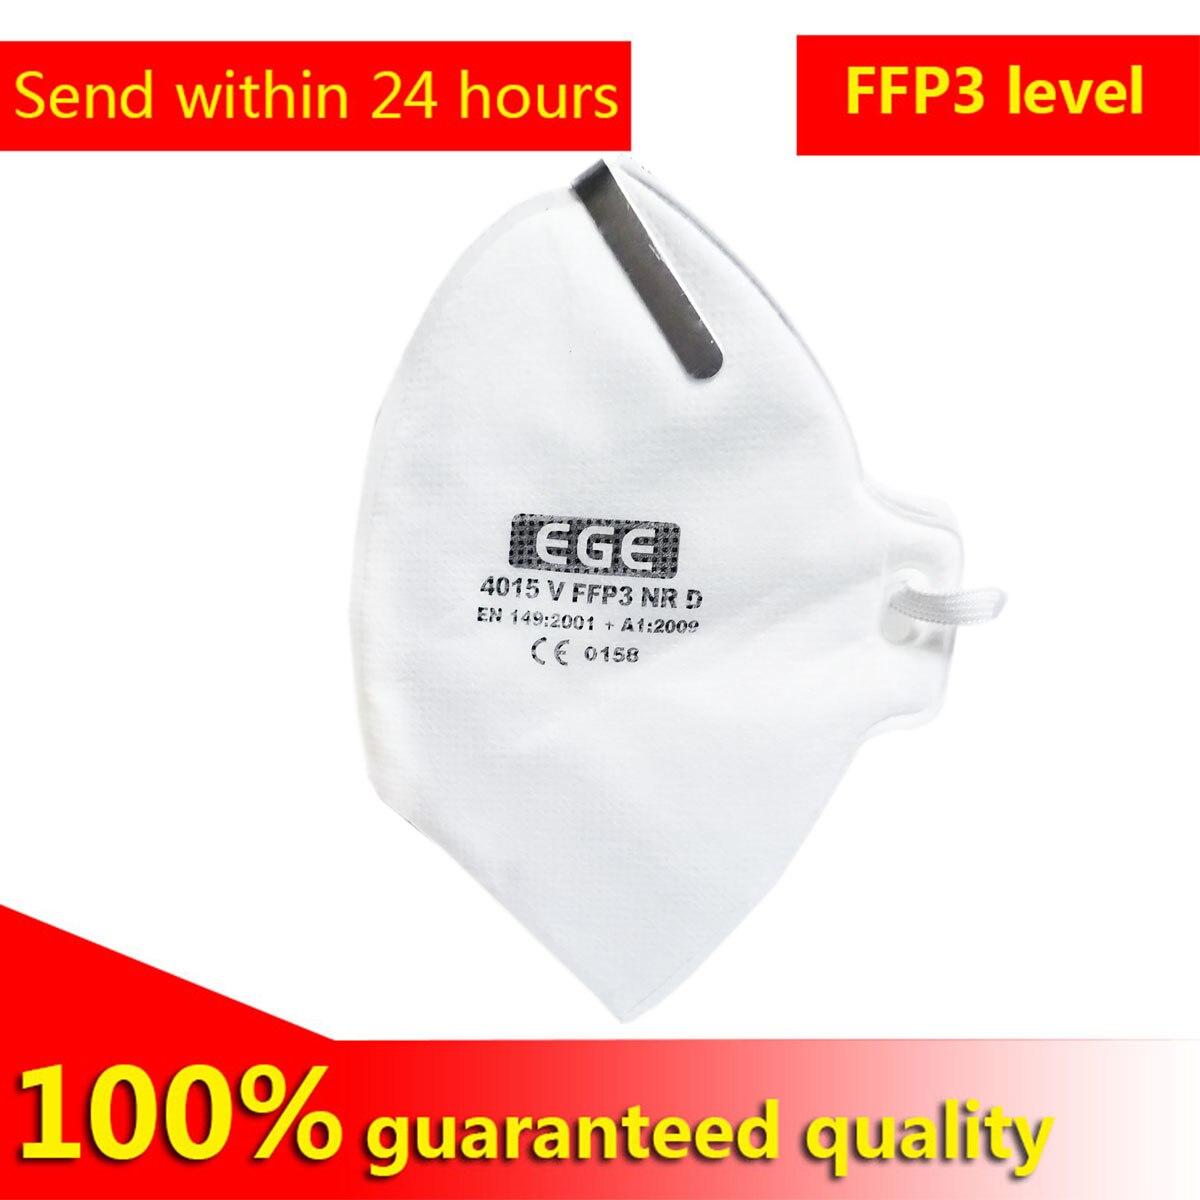 FFP3 Masks Turkey Imports European Standard EU Certification Dust And Smog PM2.5 In Stock FFP3 Grade